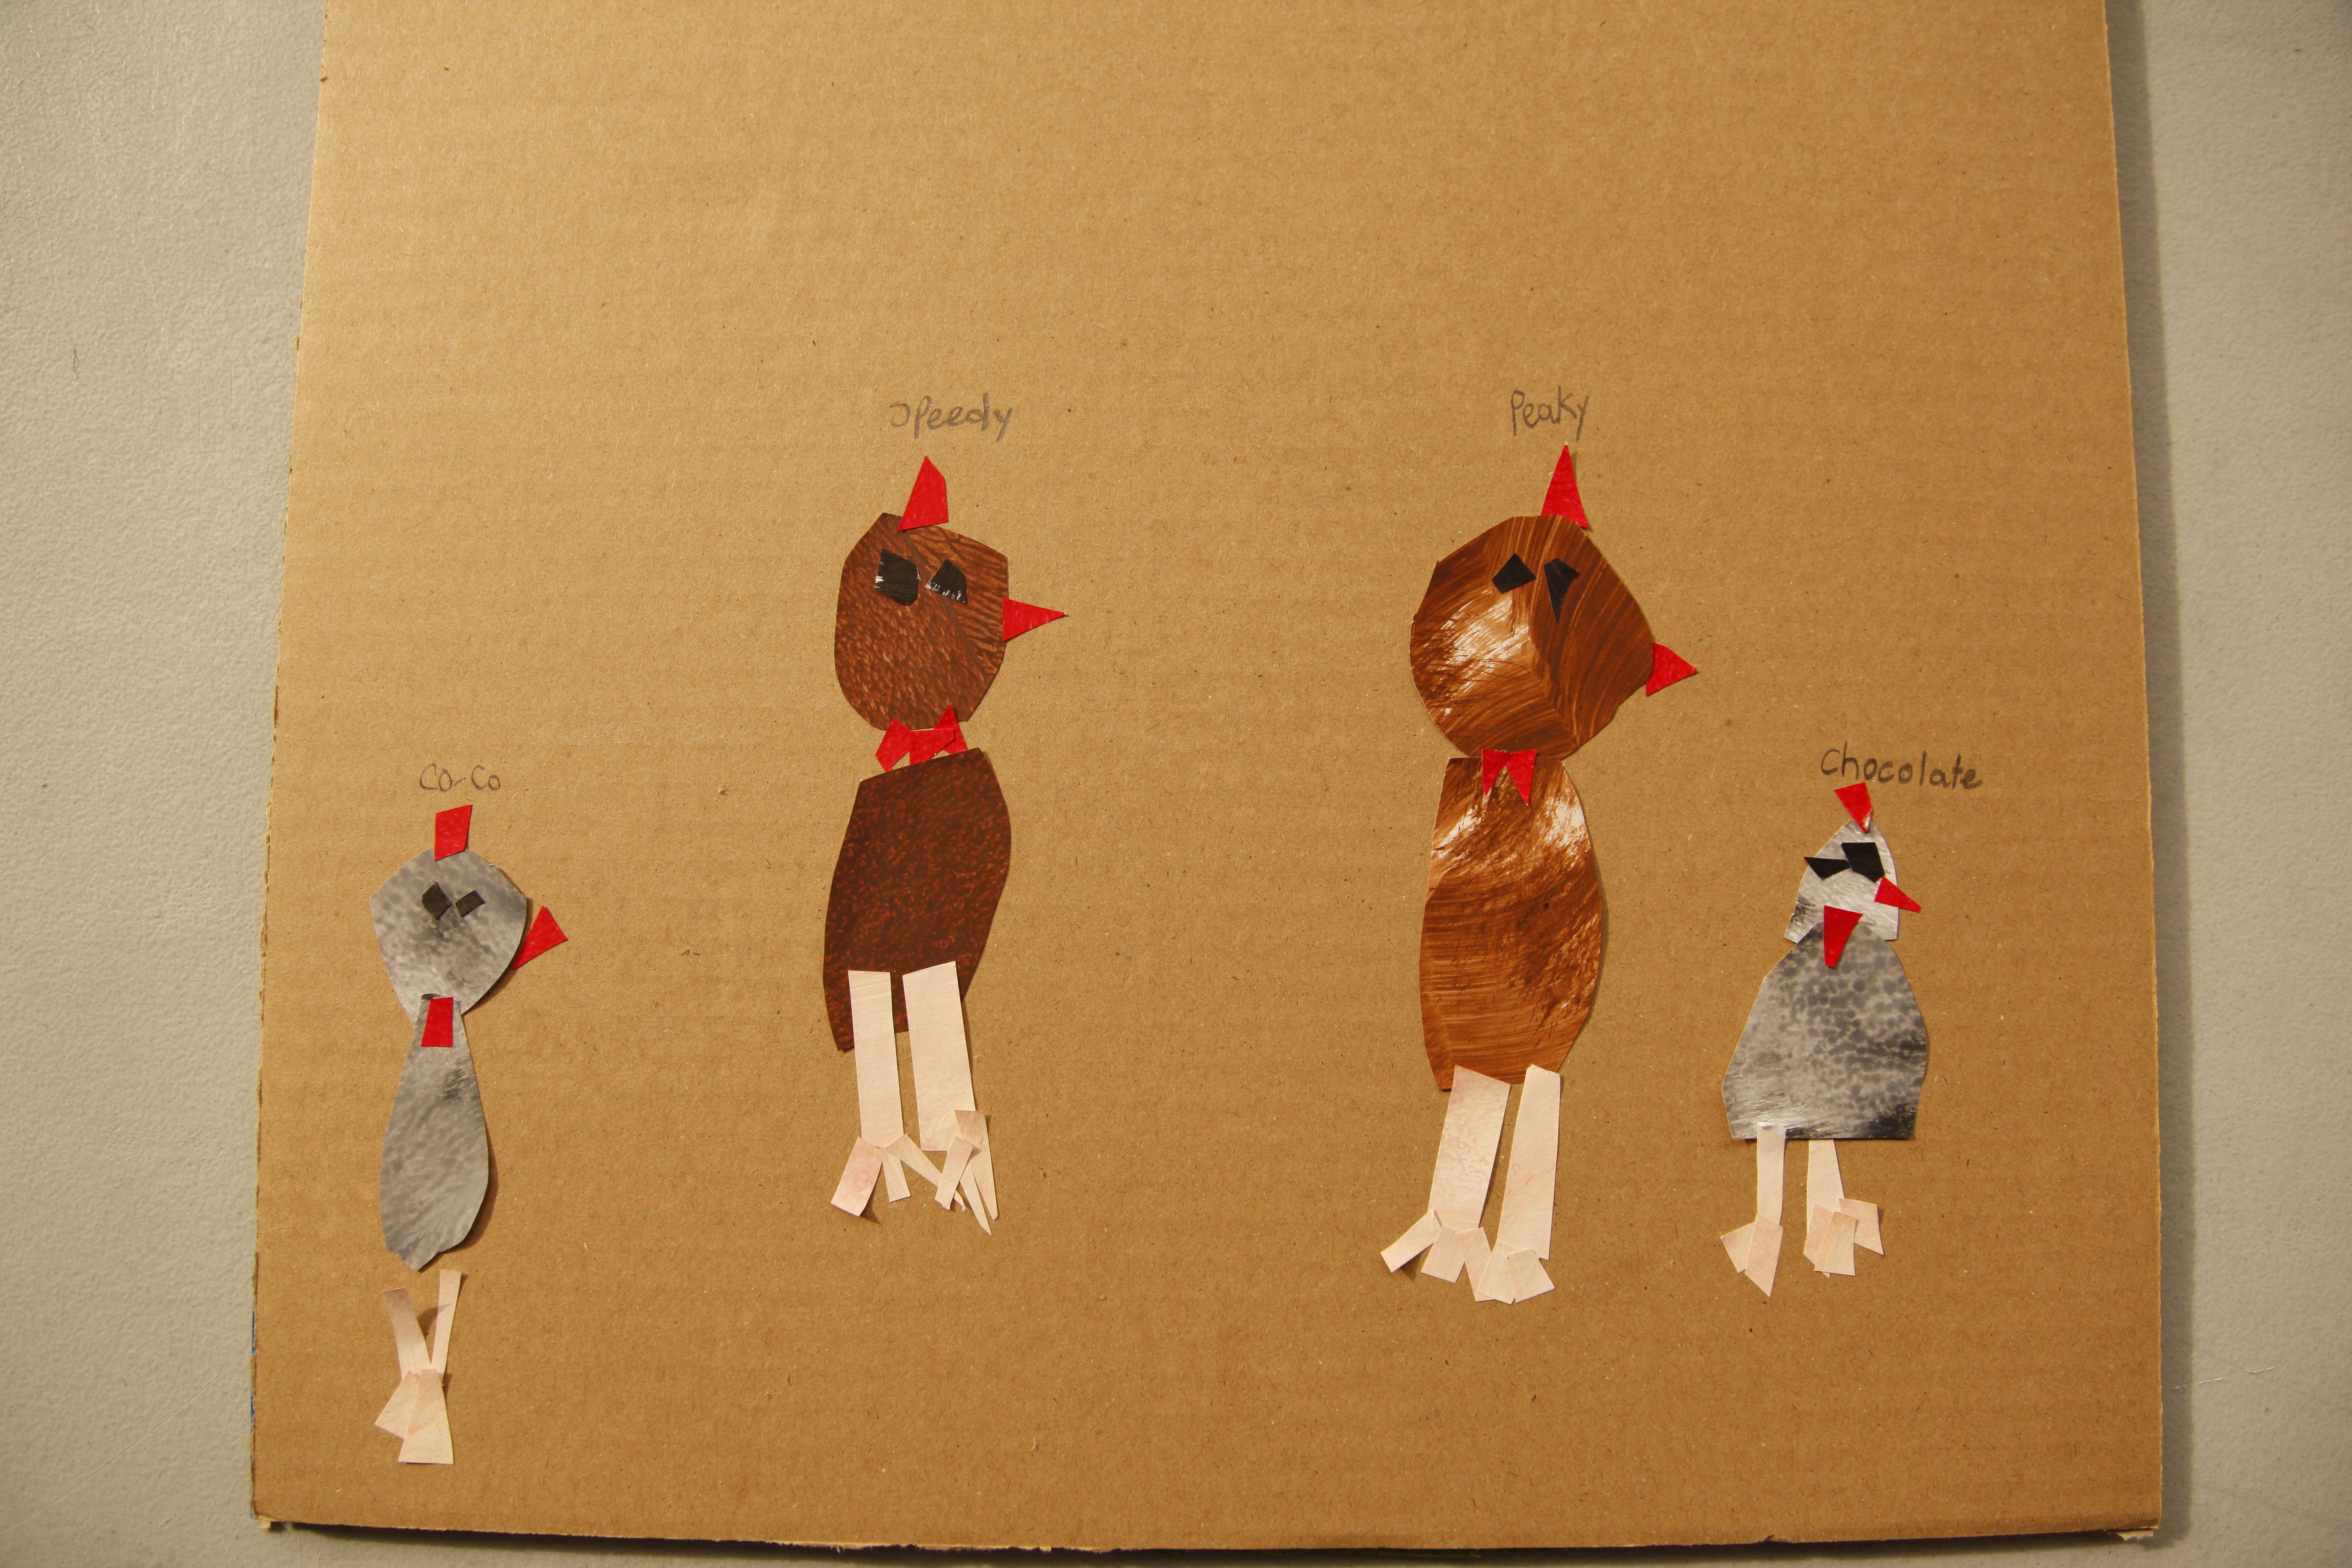 'the chickens..coco, speedy'